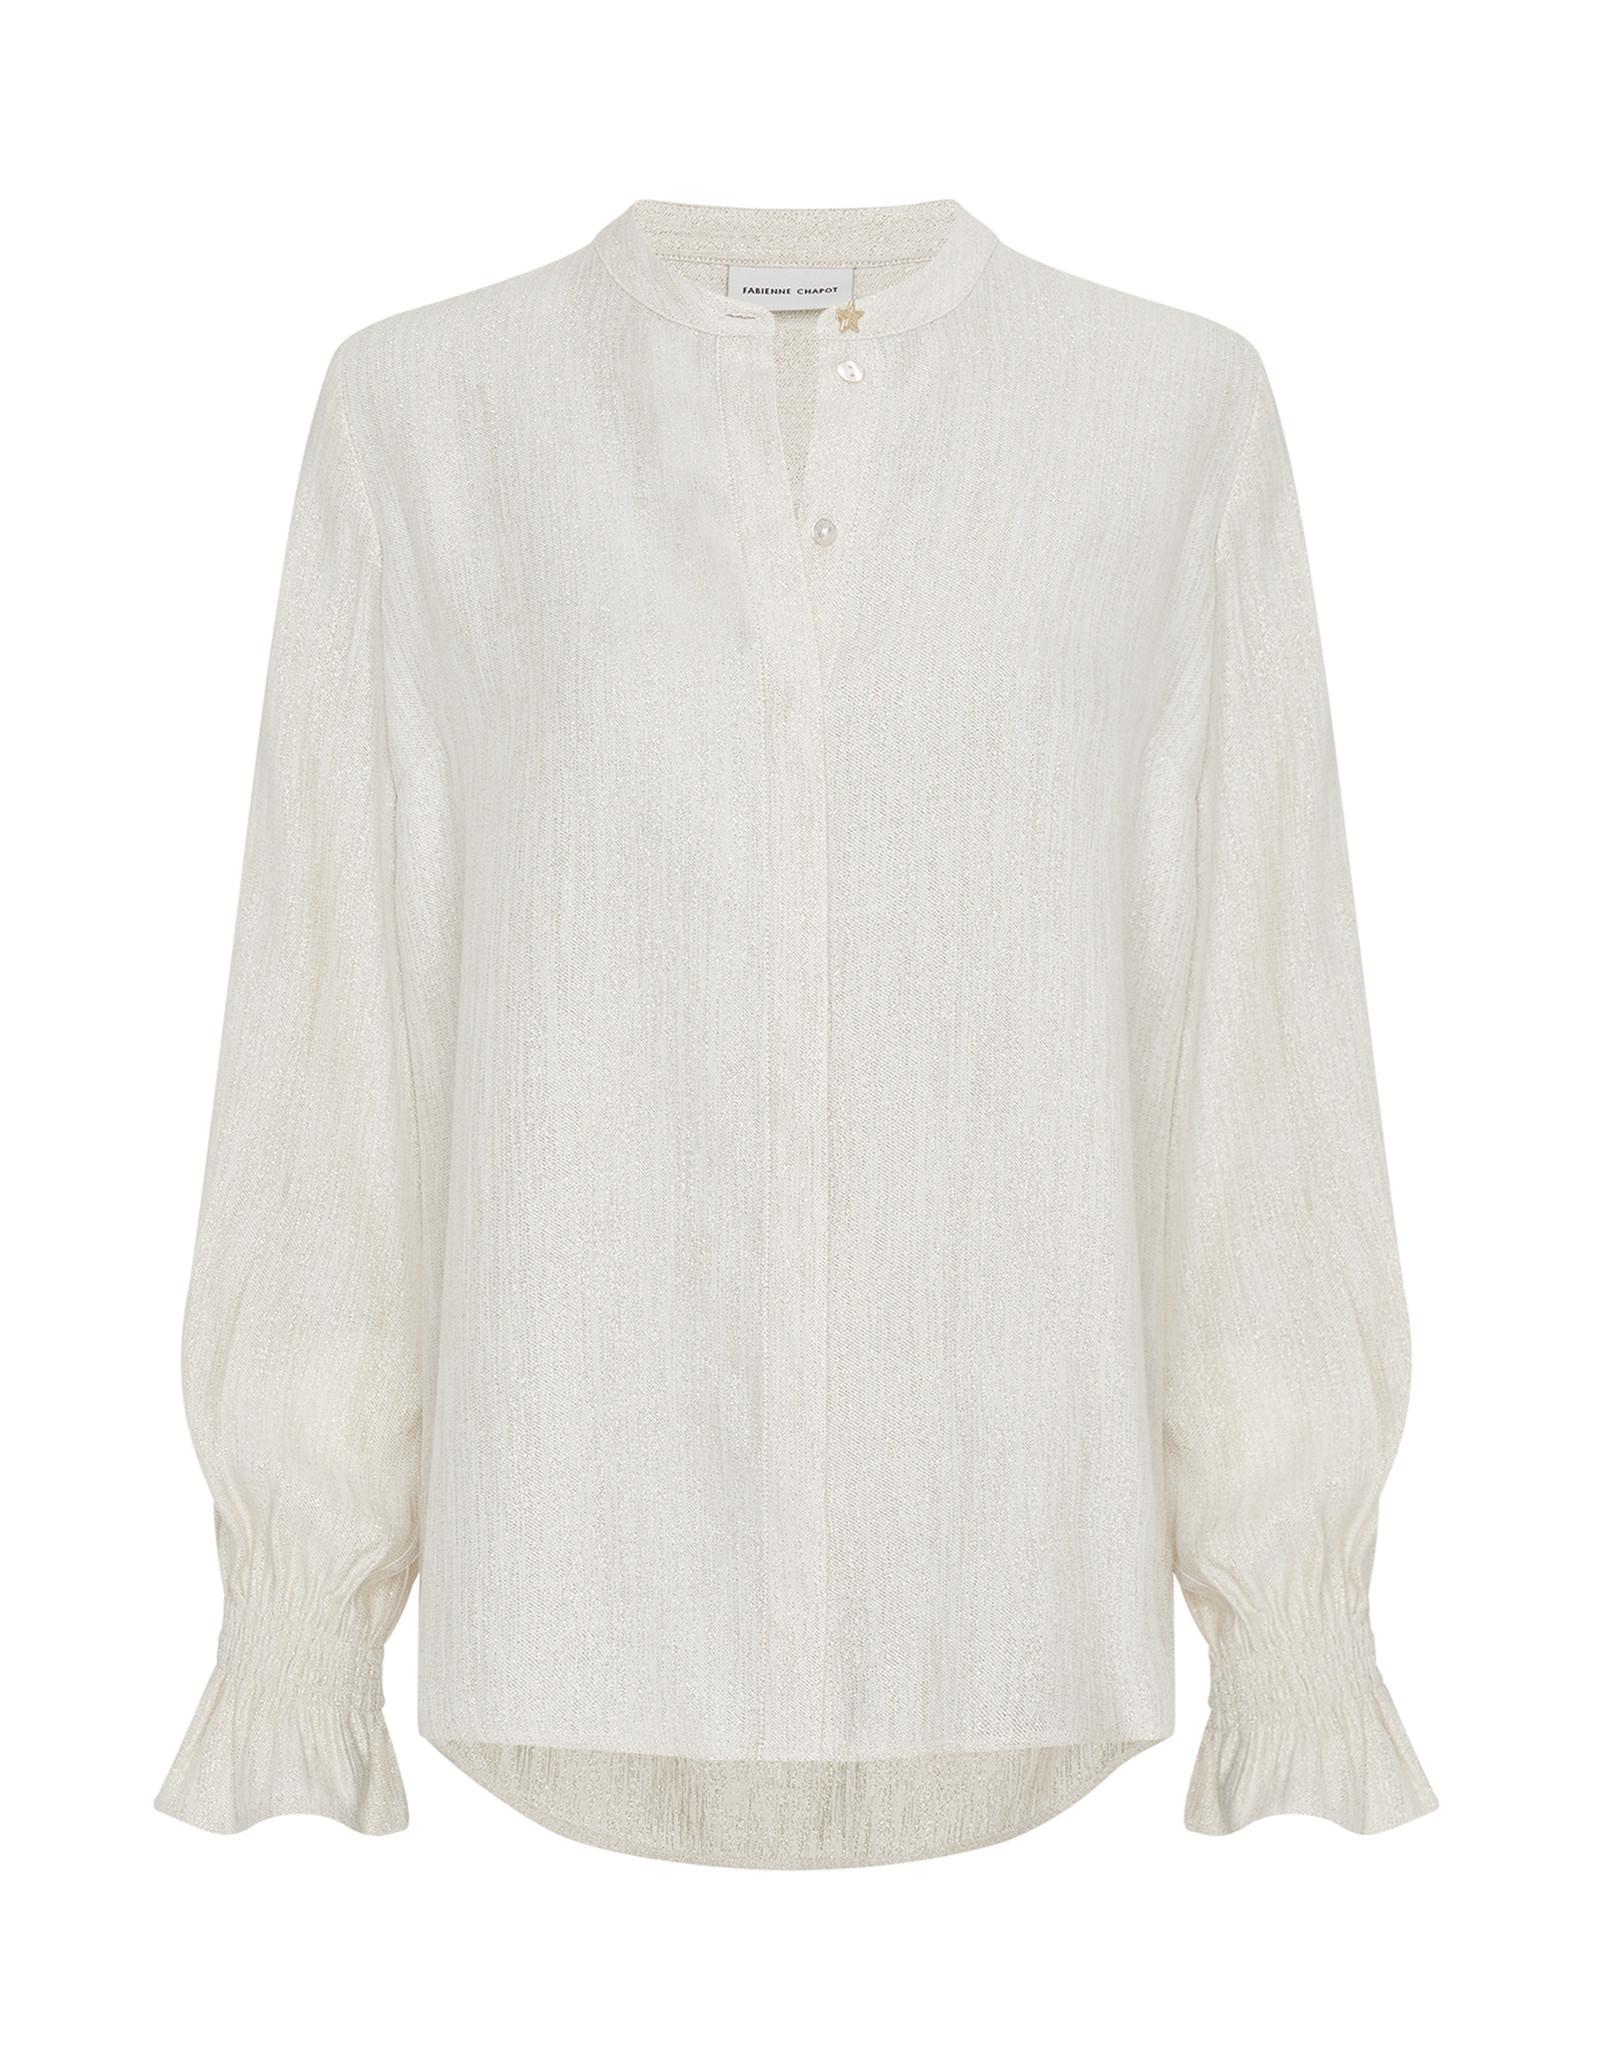 Fabienne Chapot Studio Blouse Cream White